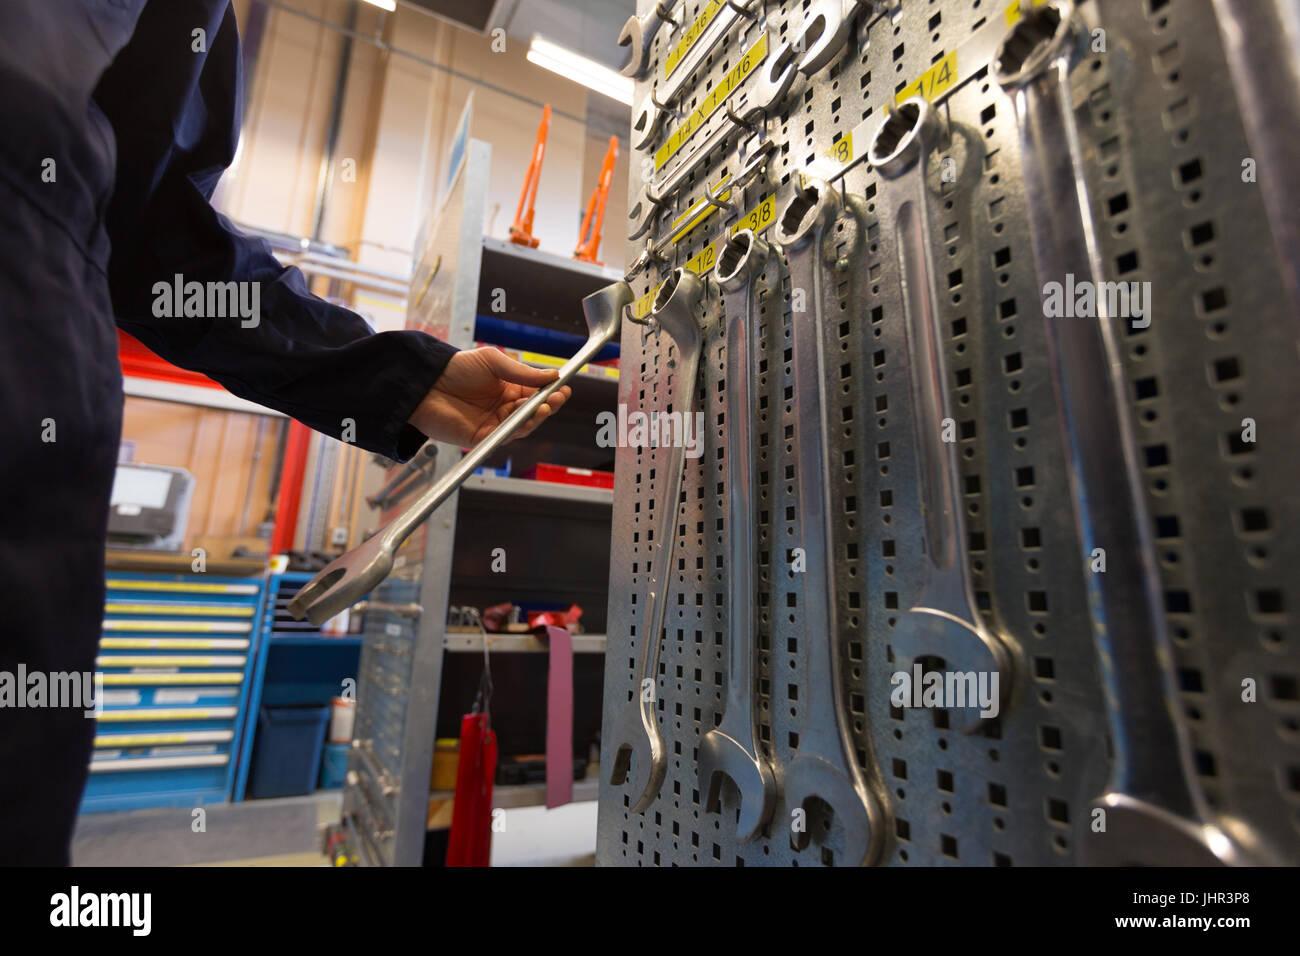 Male aircraft maintenance engineer examining various work tool at airlines maintenance facility - Stock Image